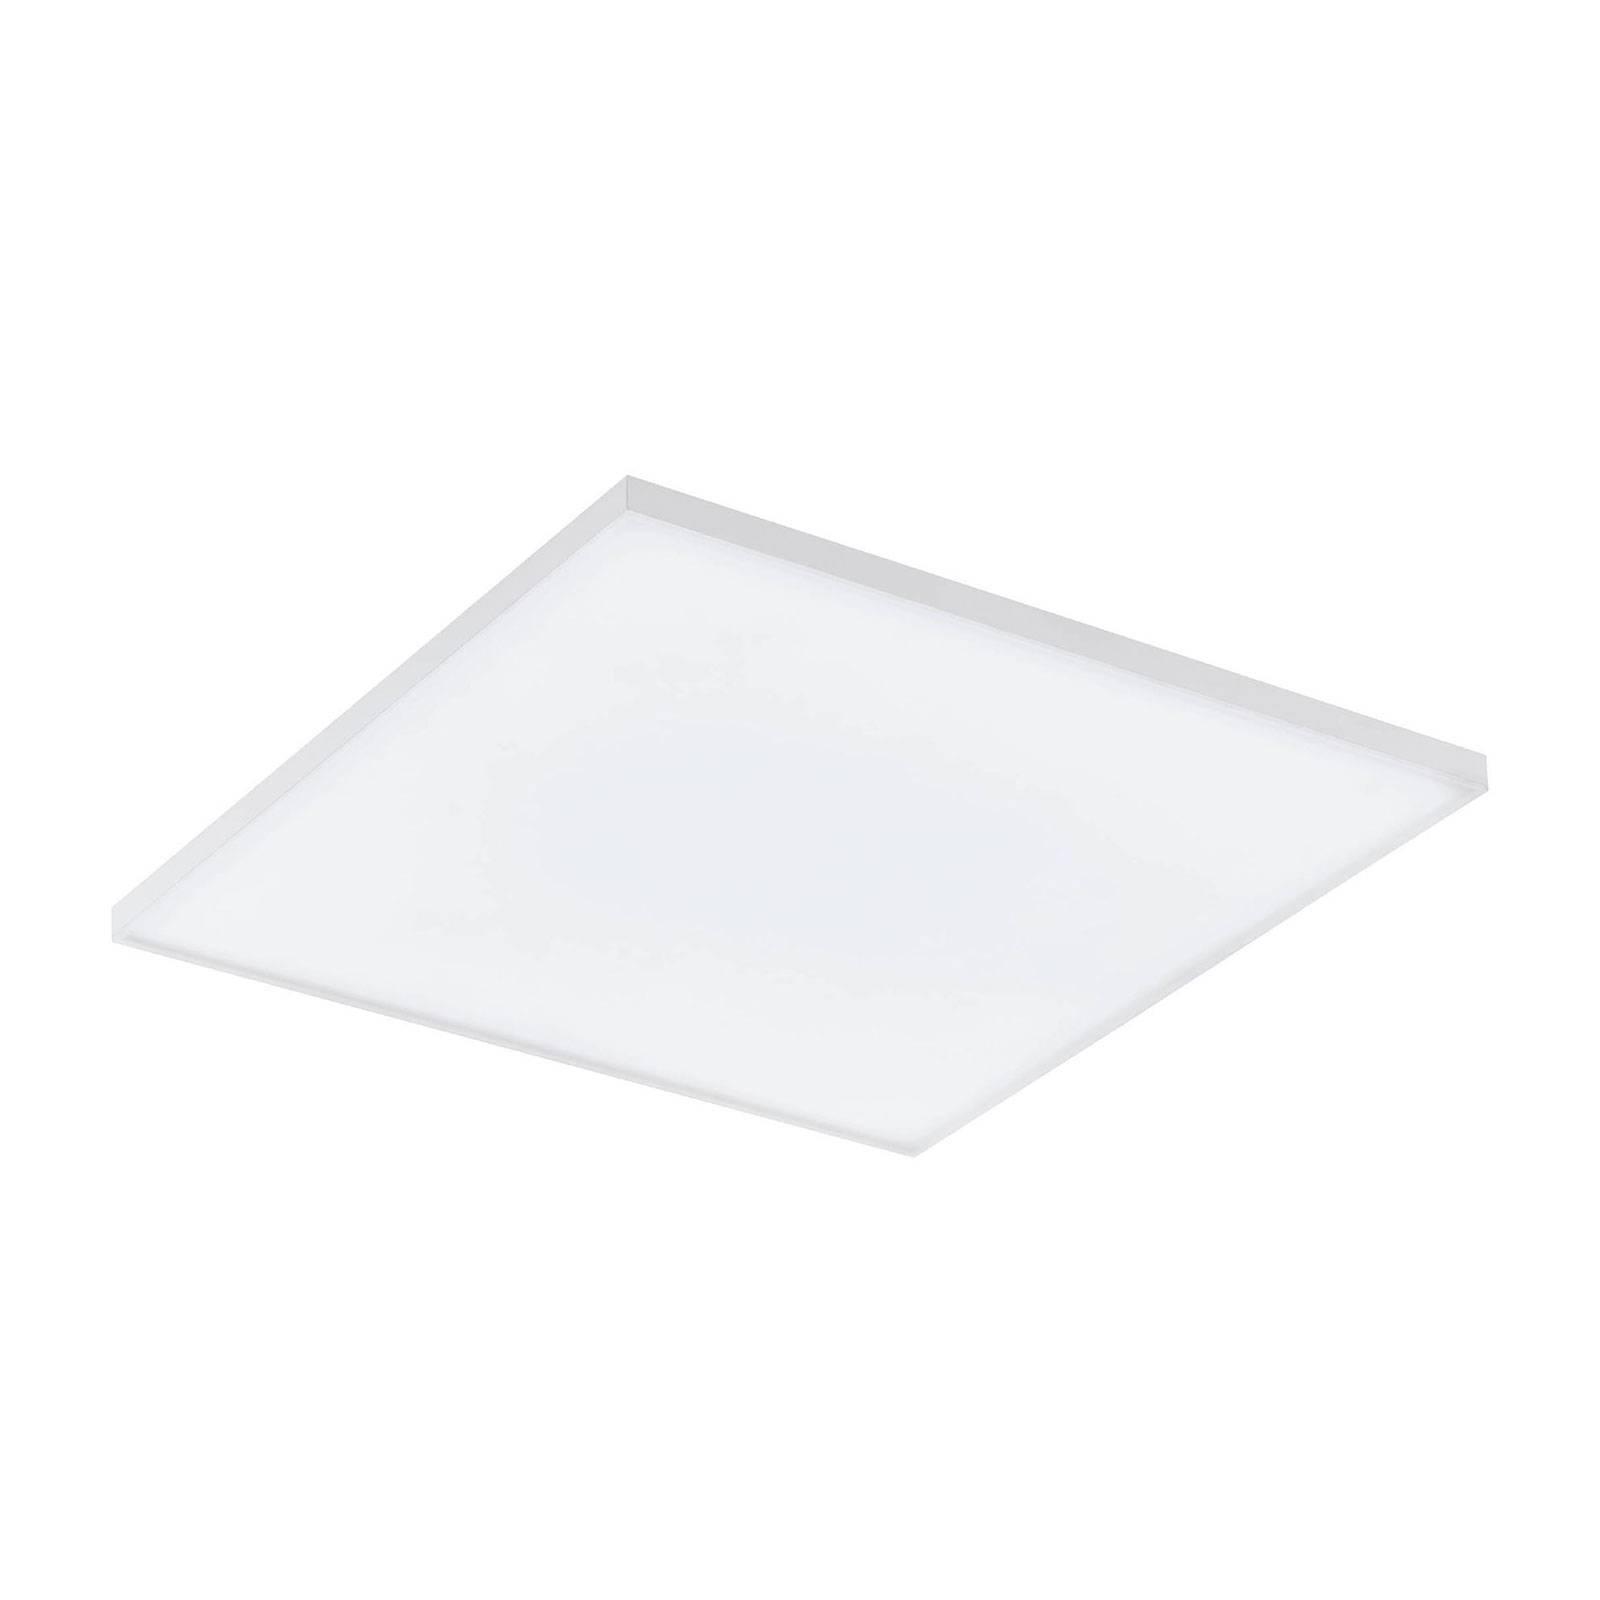 EGLO connect Turcona-C -LED-kattovalaisin 45x45 cm